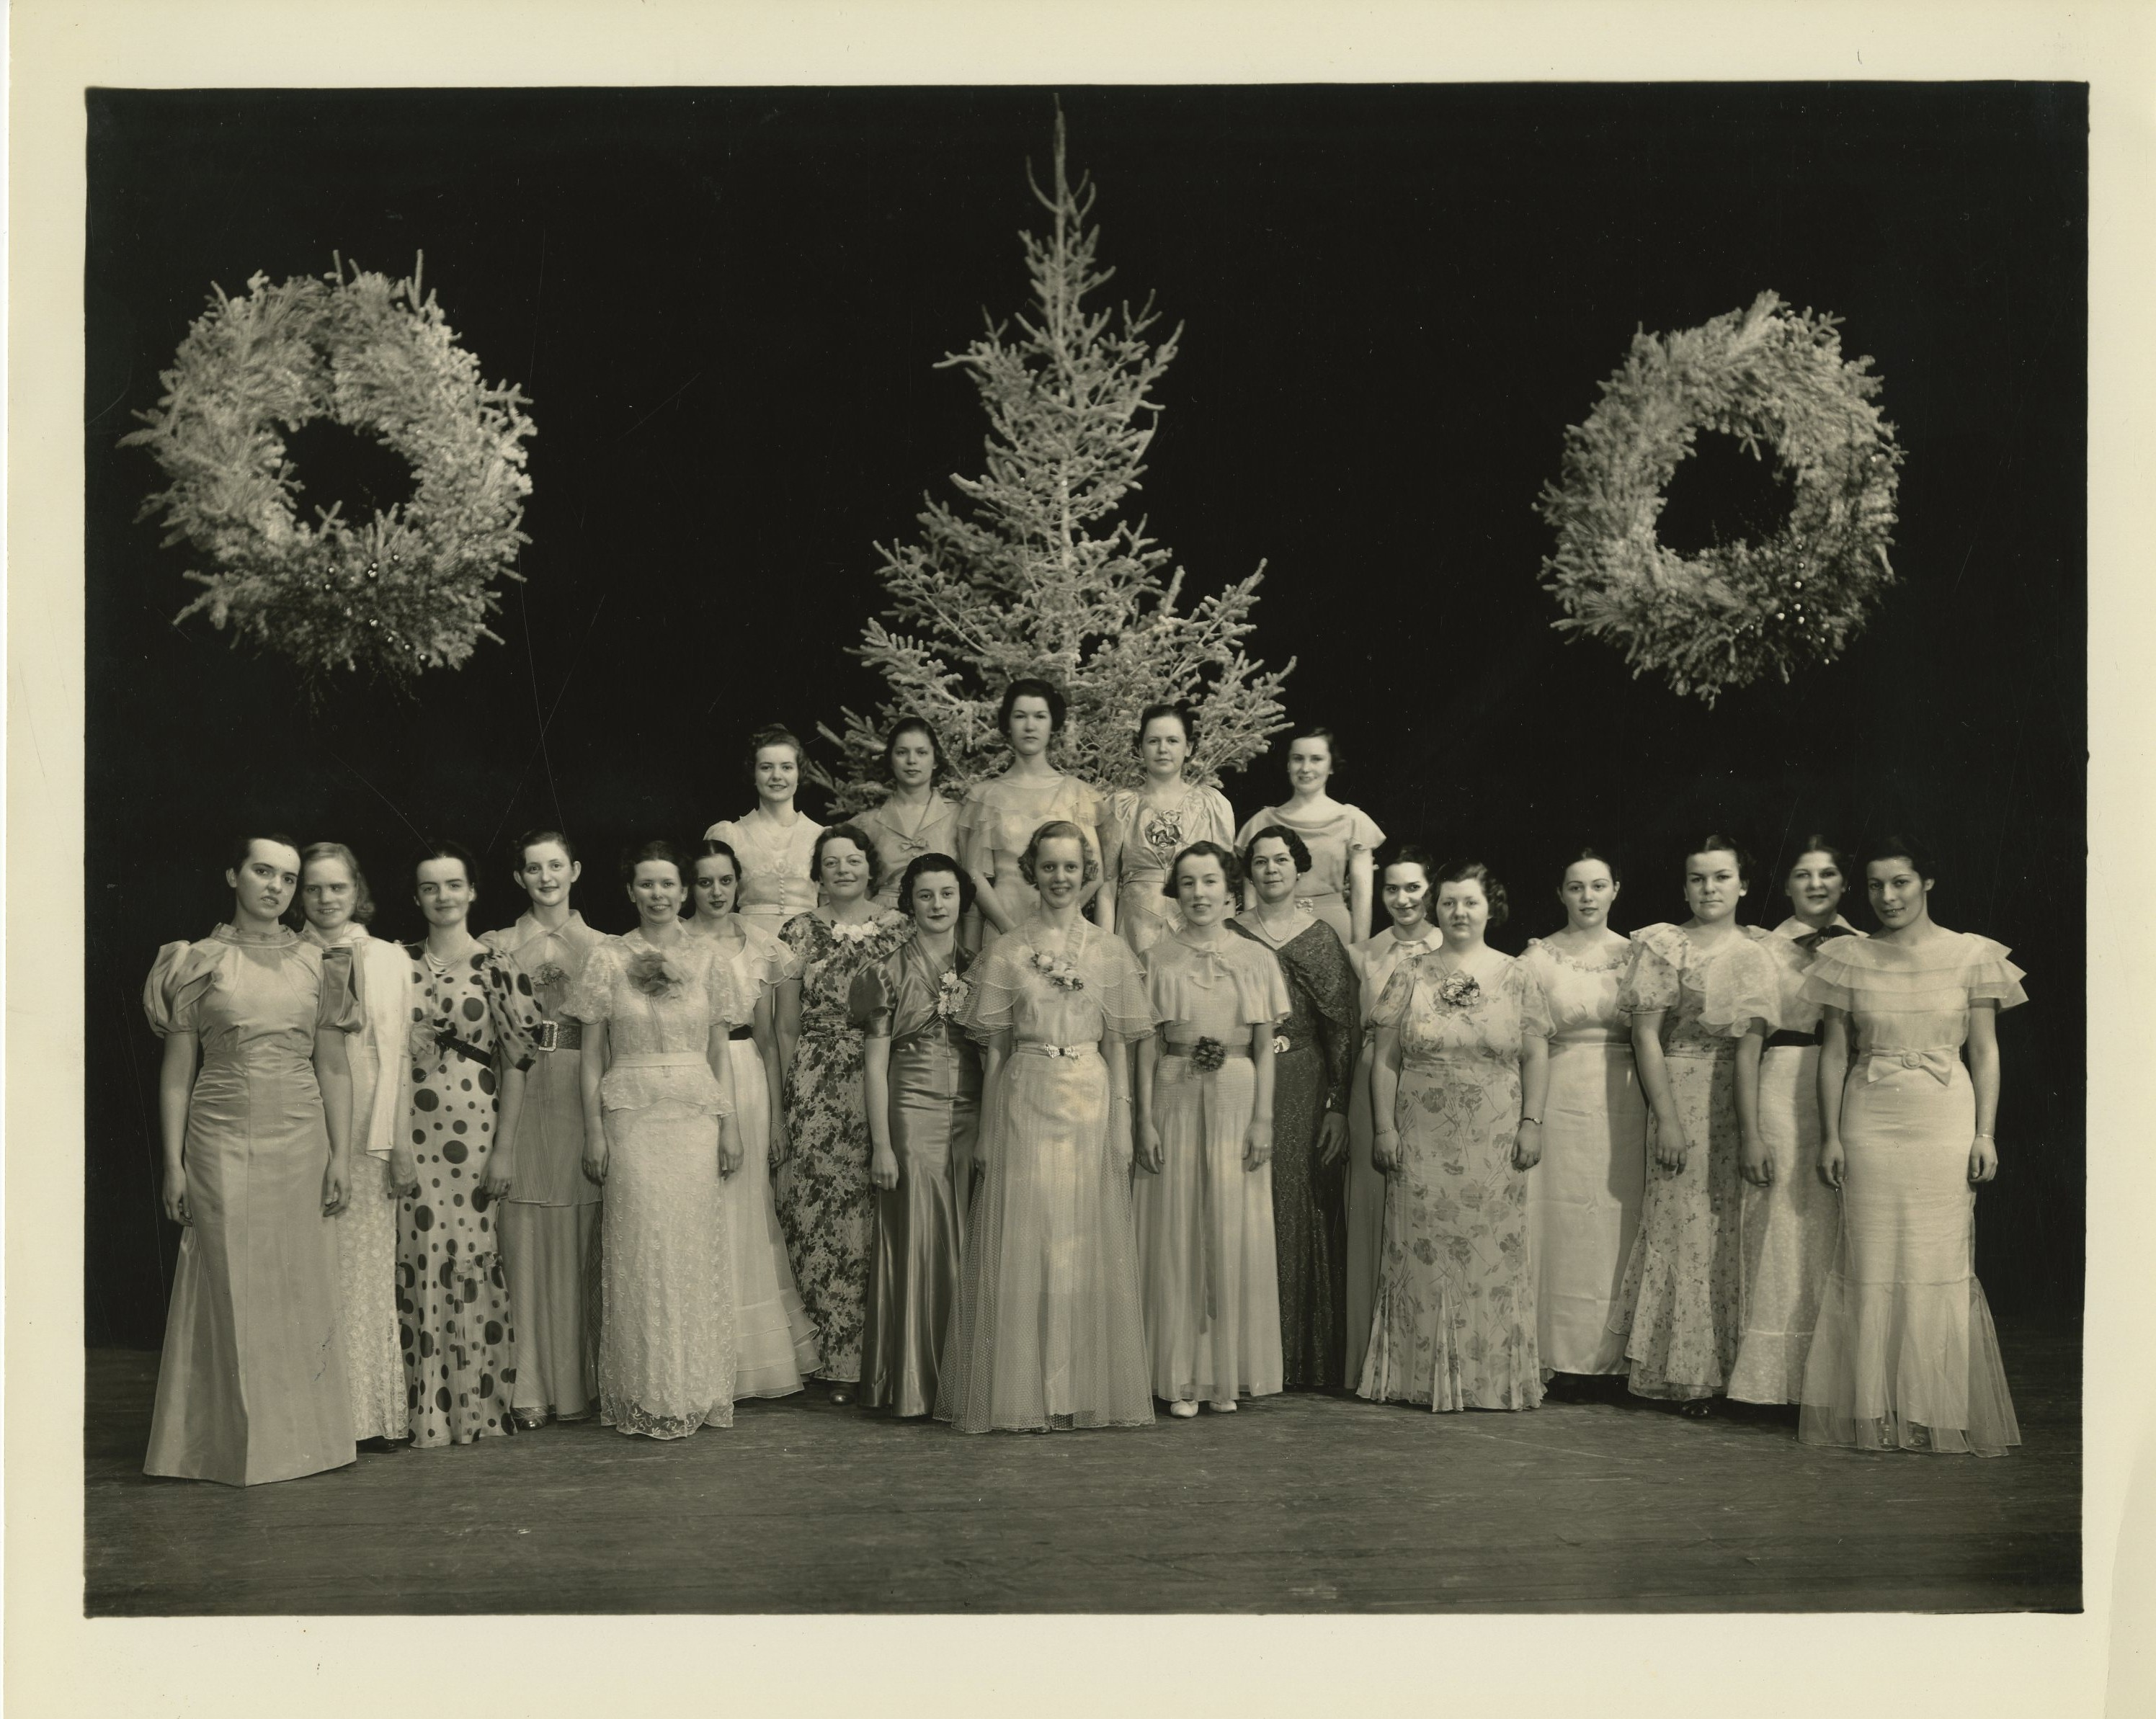 1936 Candlelighting ceremony